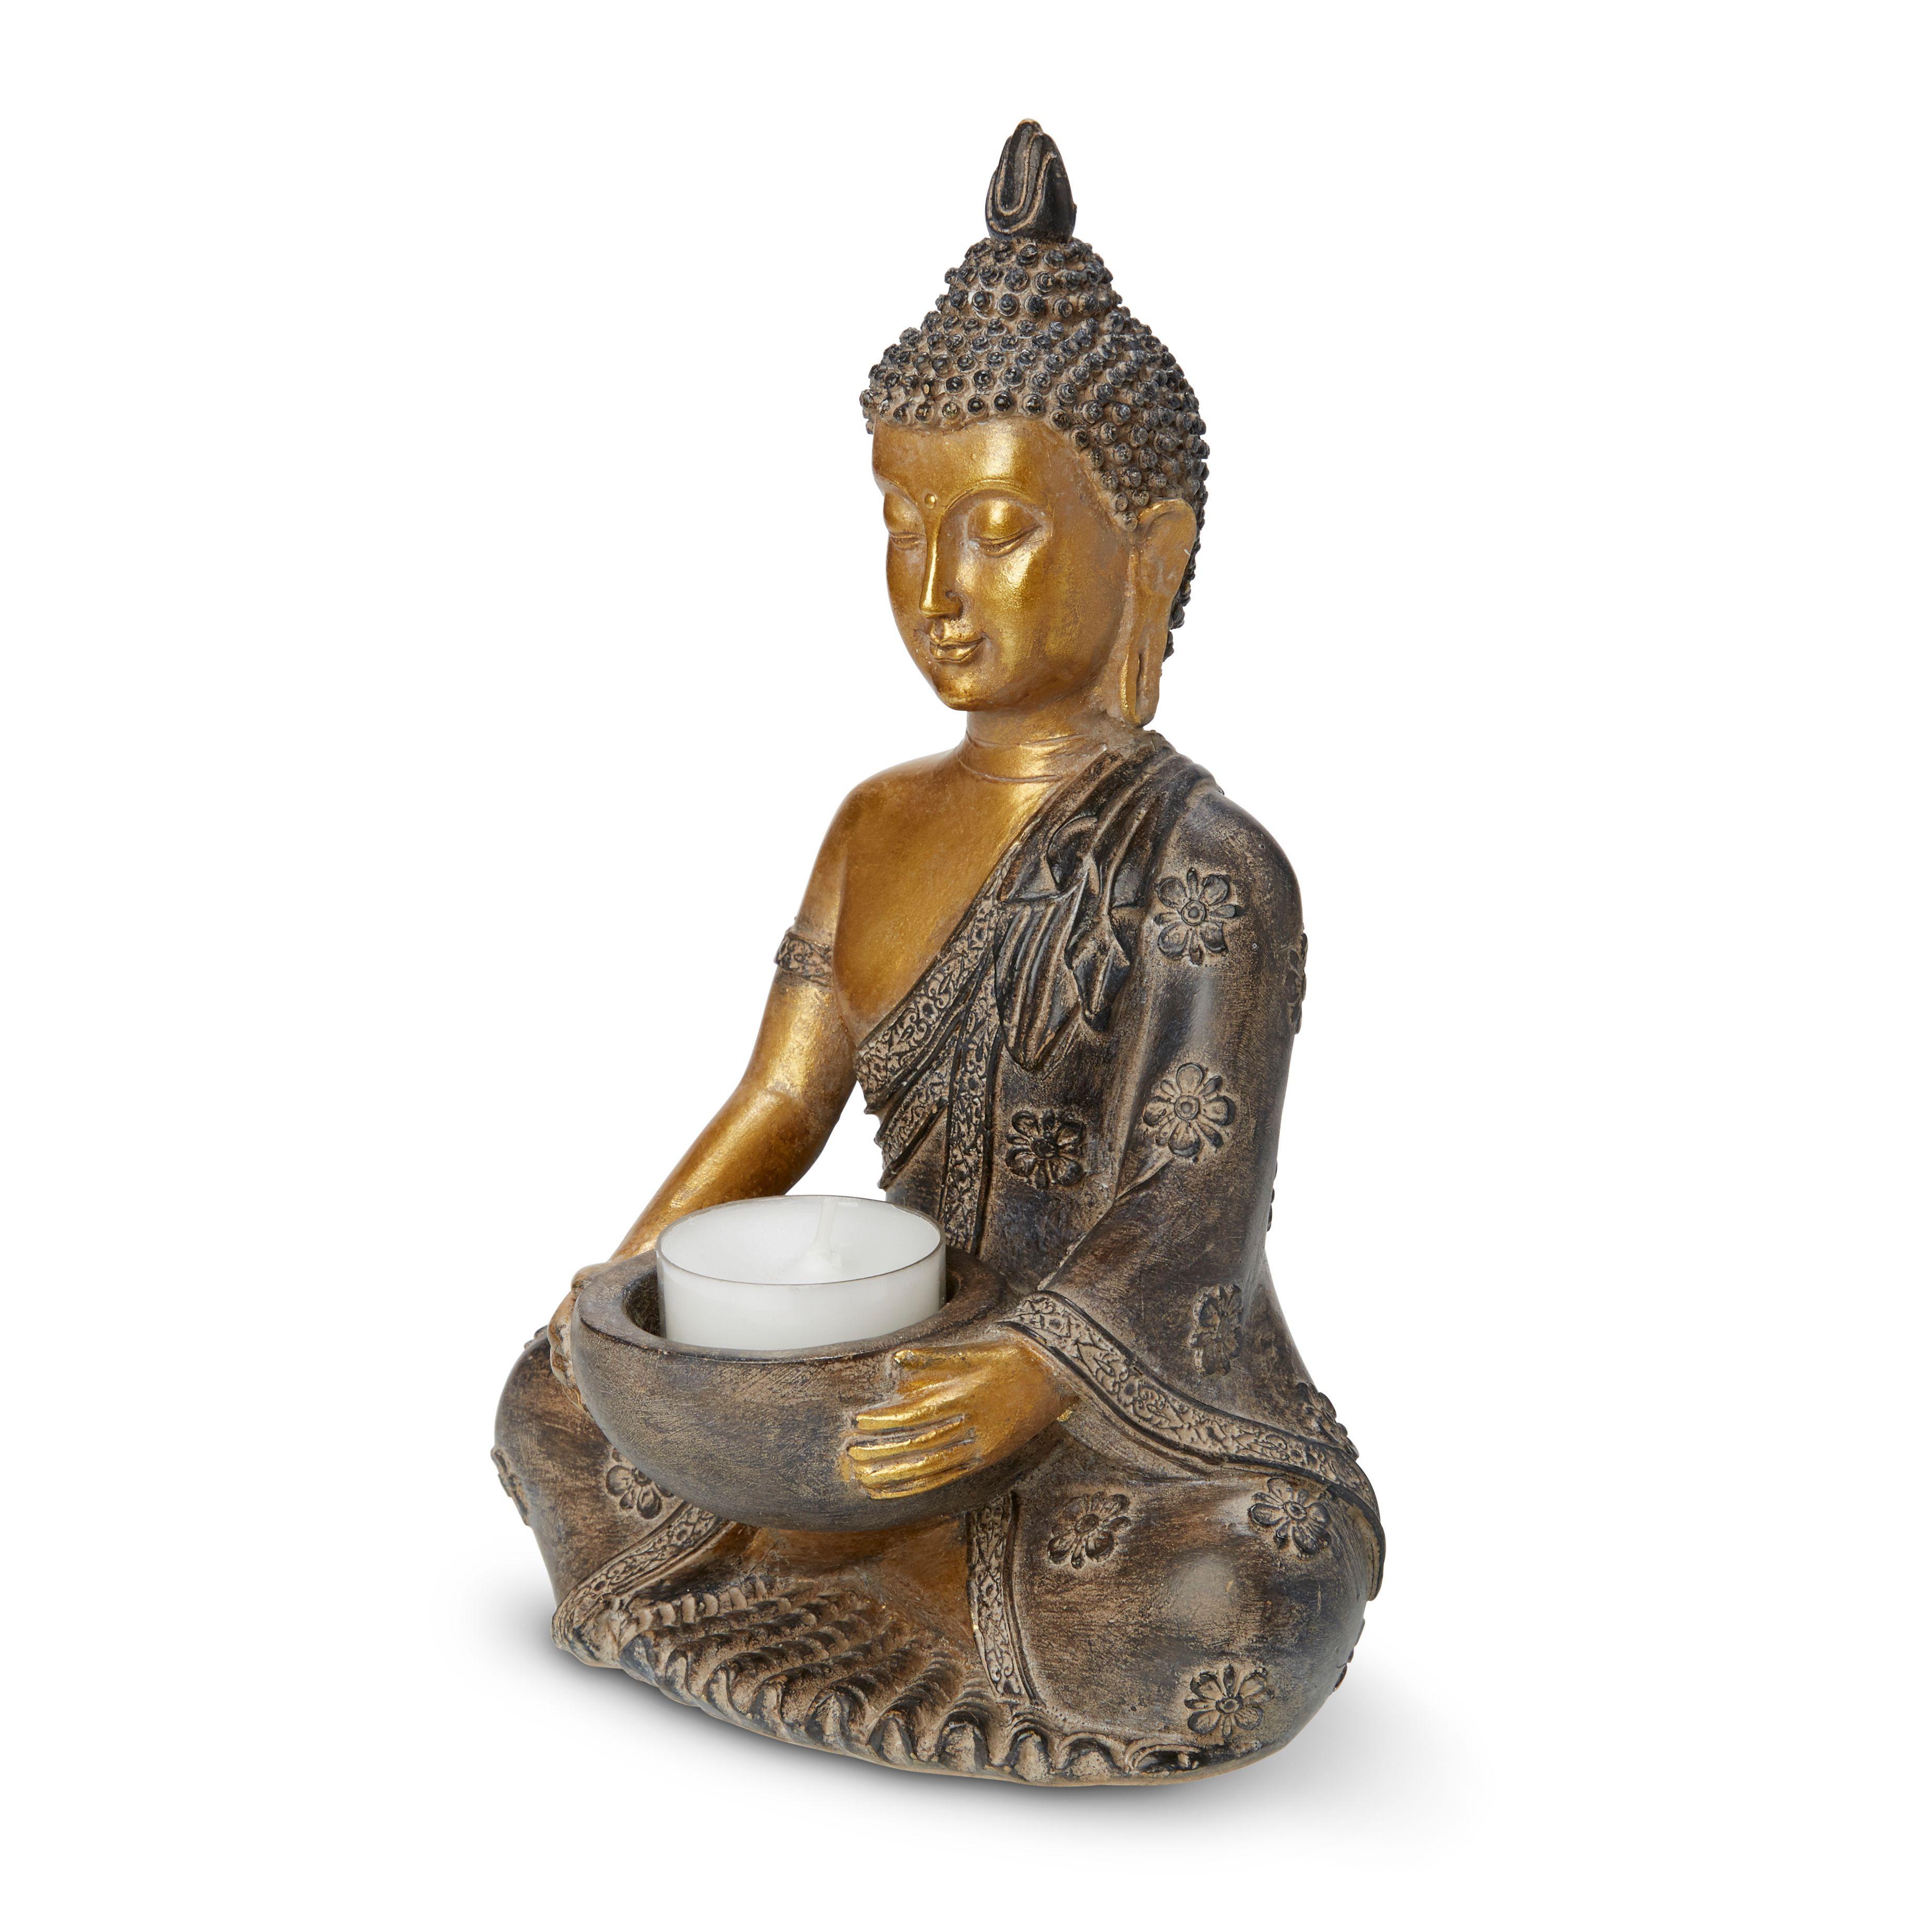 Gold Effect Sitting Buddha Resin Tealight Holder